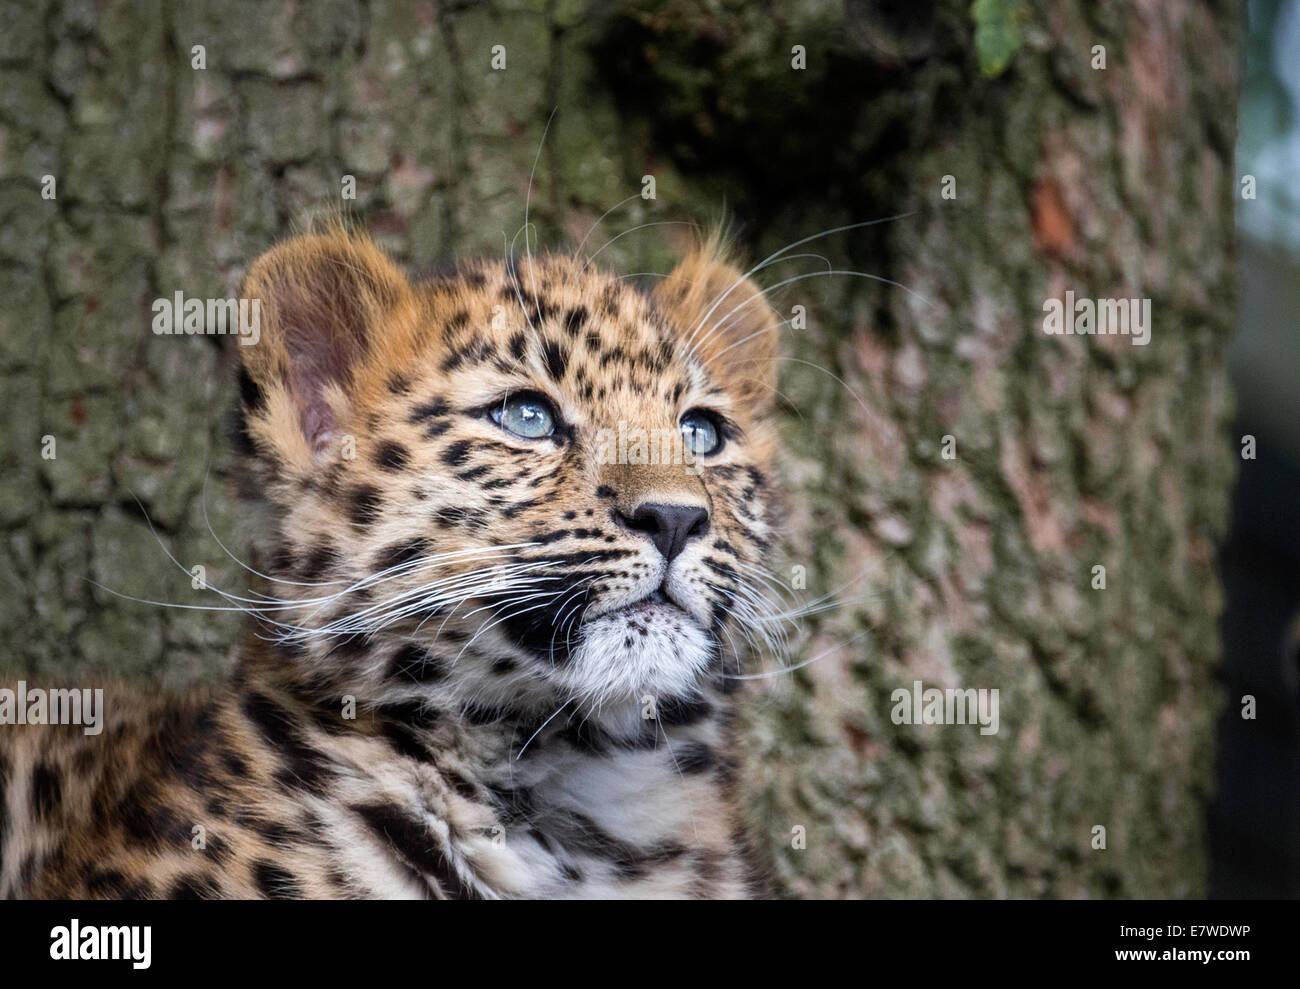 Female Amur leopard cub looking up - Stock Image